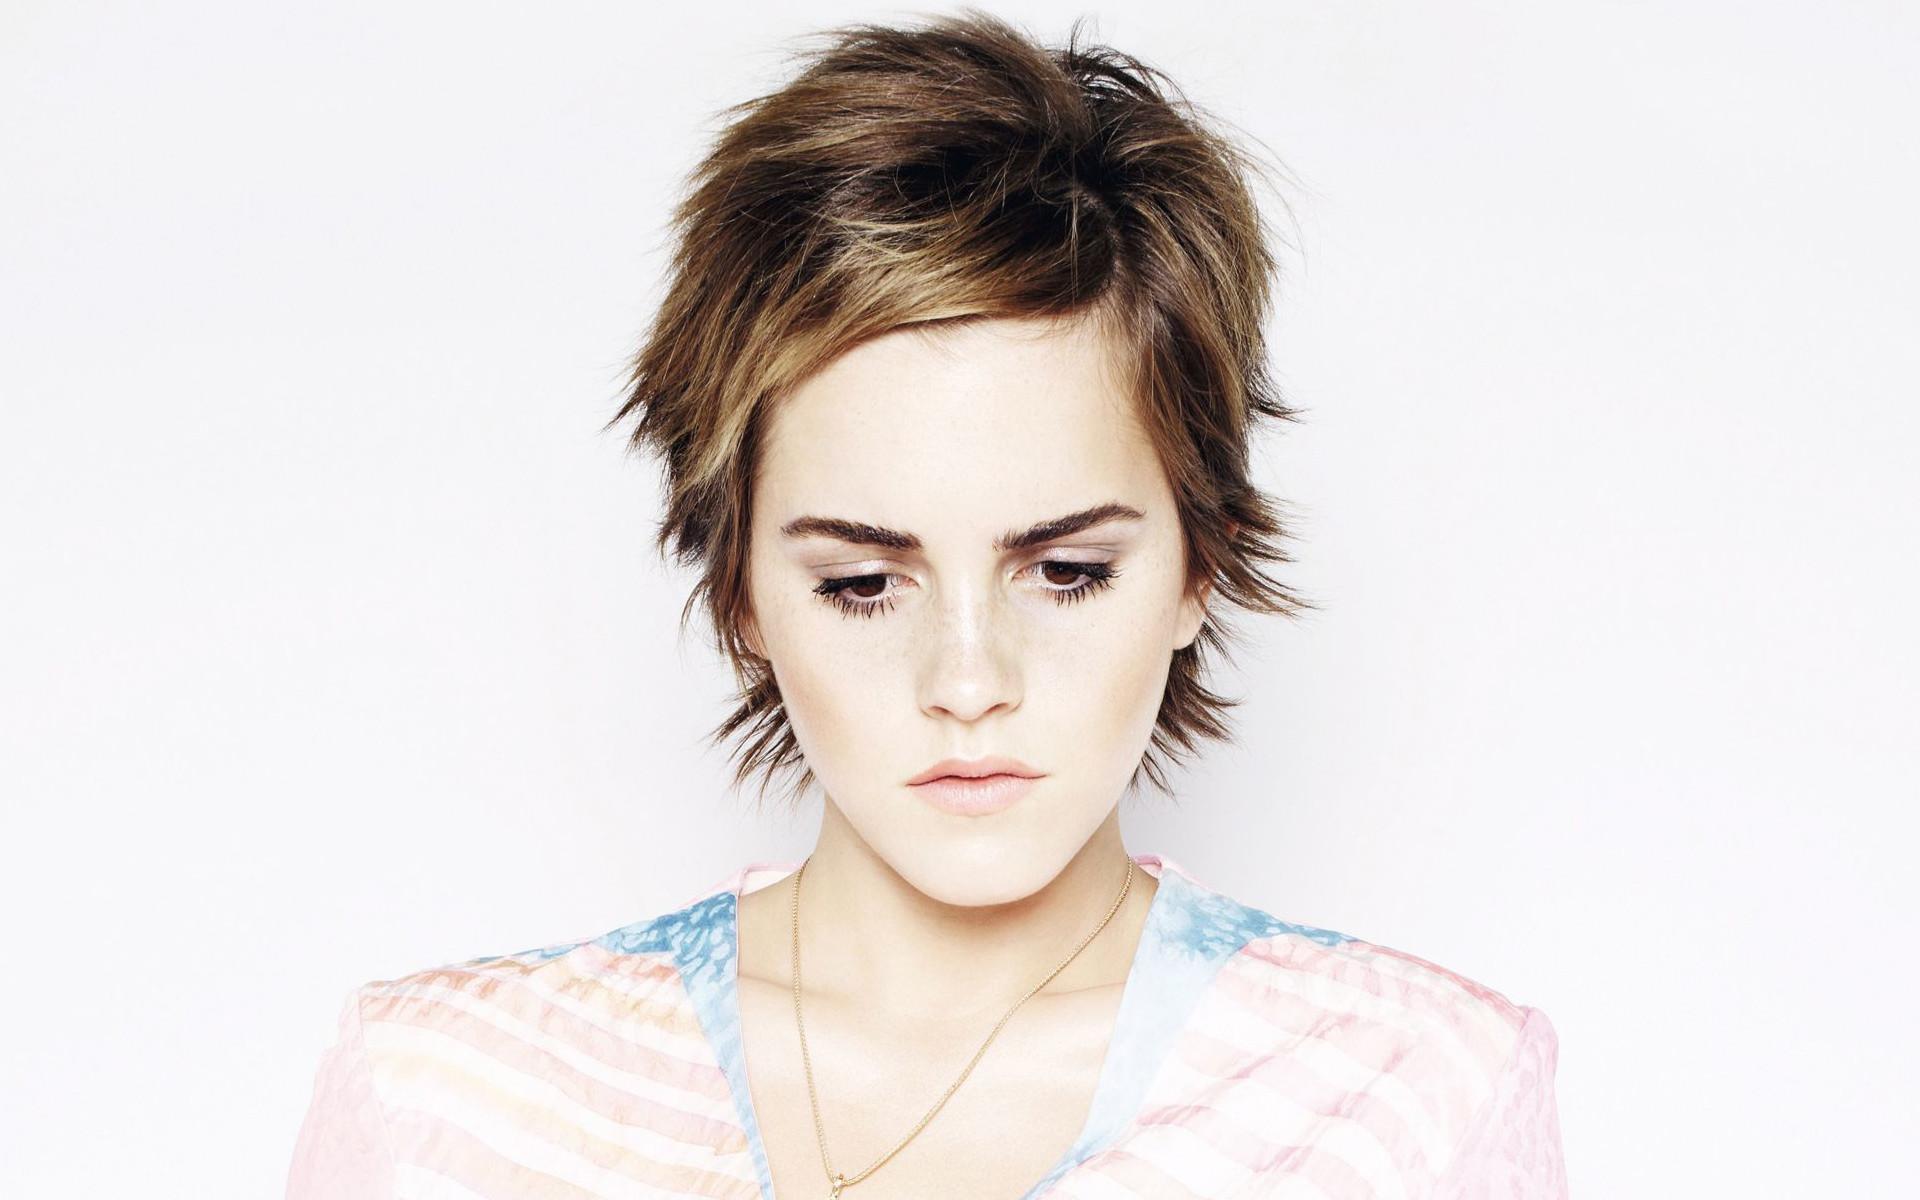 emma watson   Emma Watson HD 1   Holy HERMIONE   Pinterest   Hermione, Emma  watson and Hermione granger